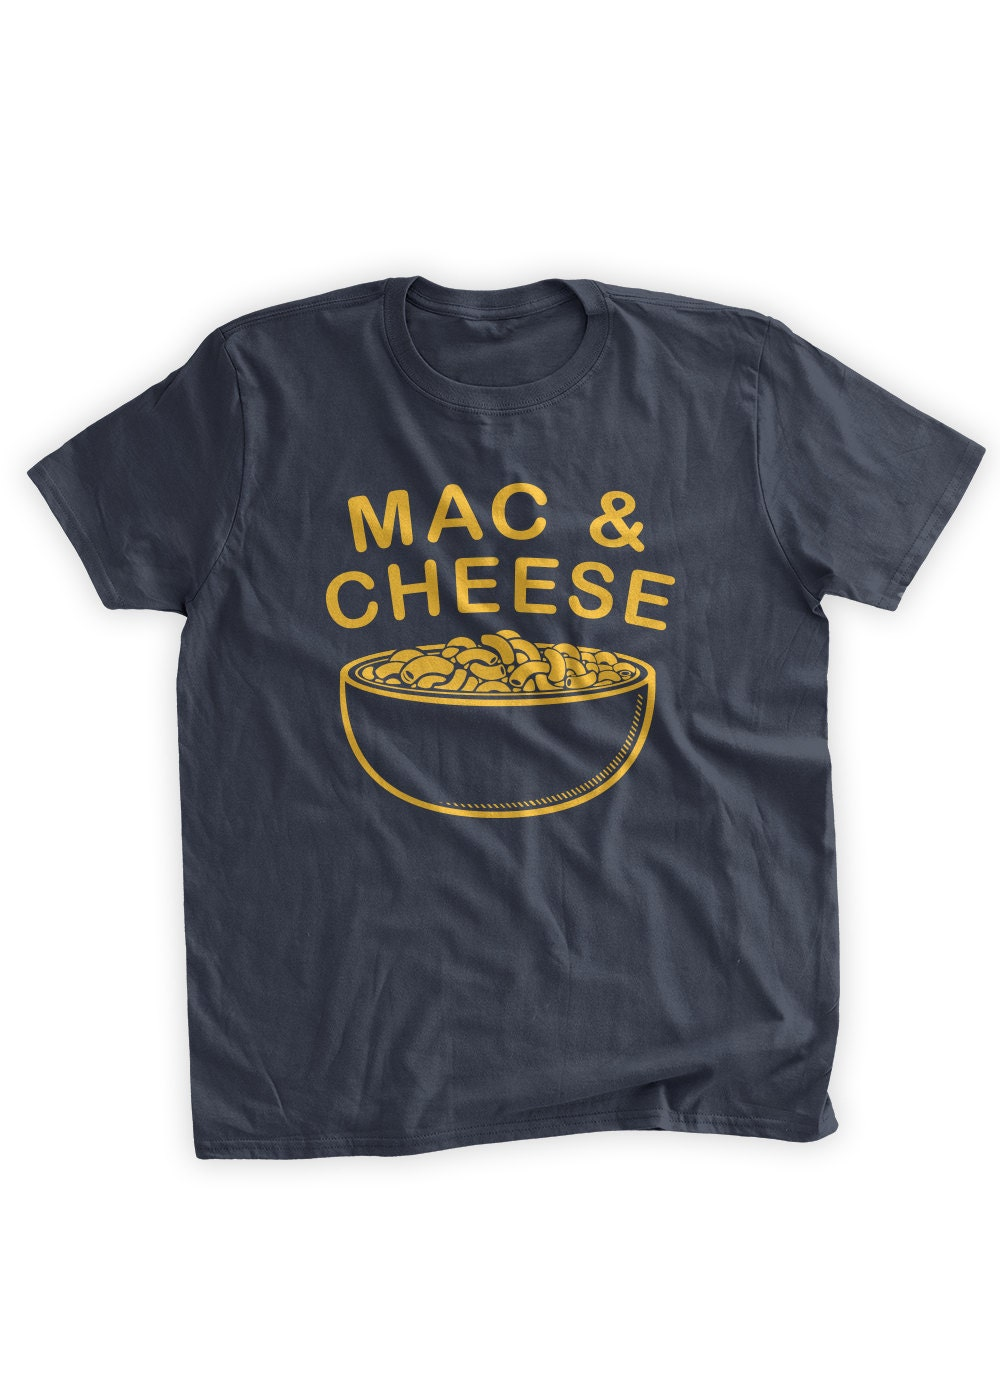 Bowl of Cereal OR Mac /& Cheese Stud Earrings